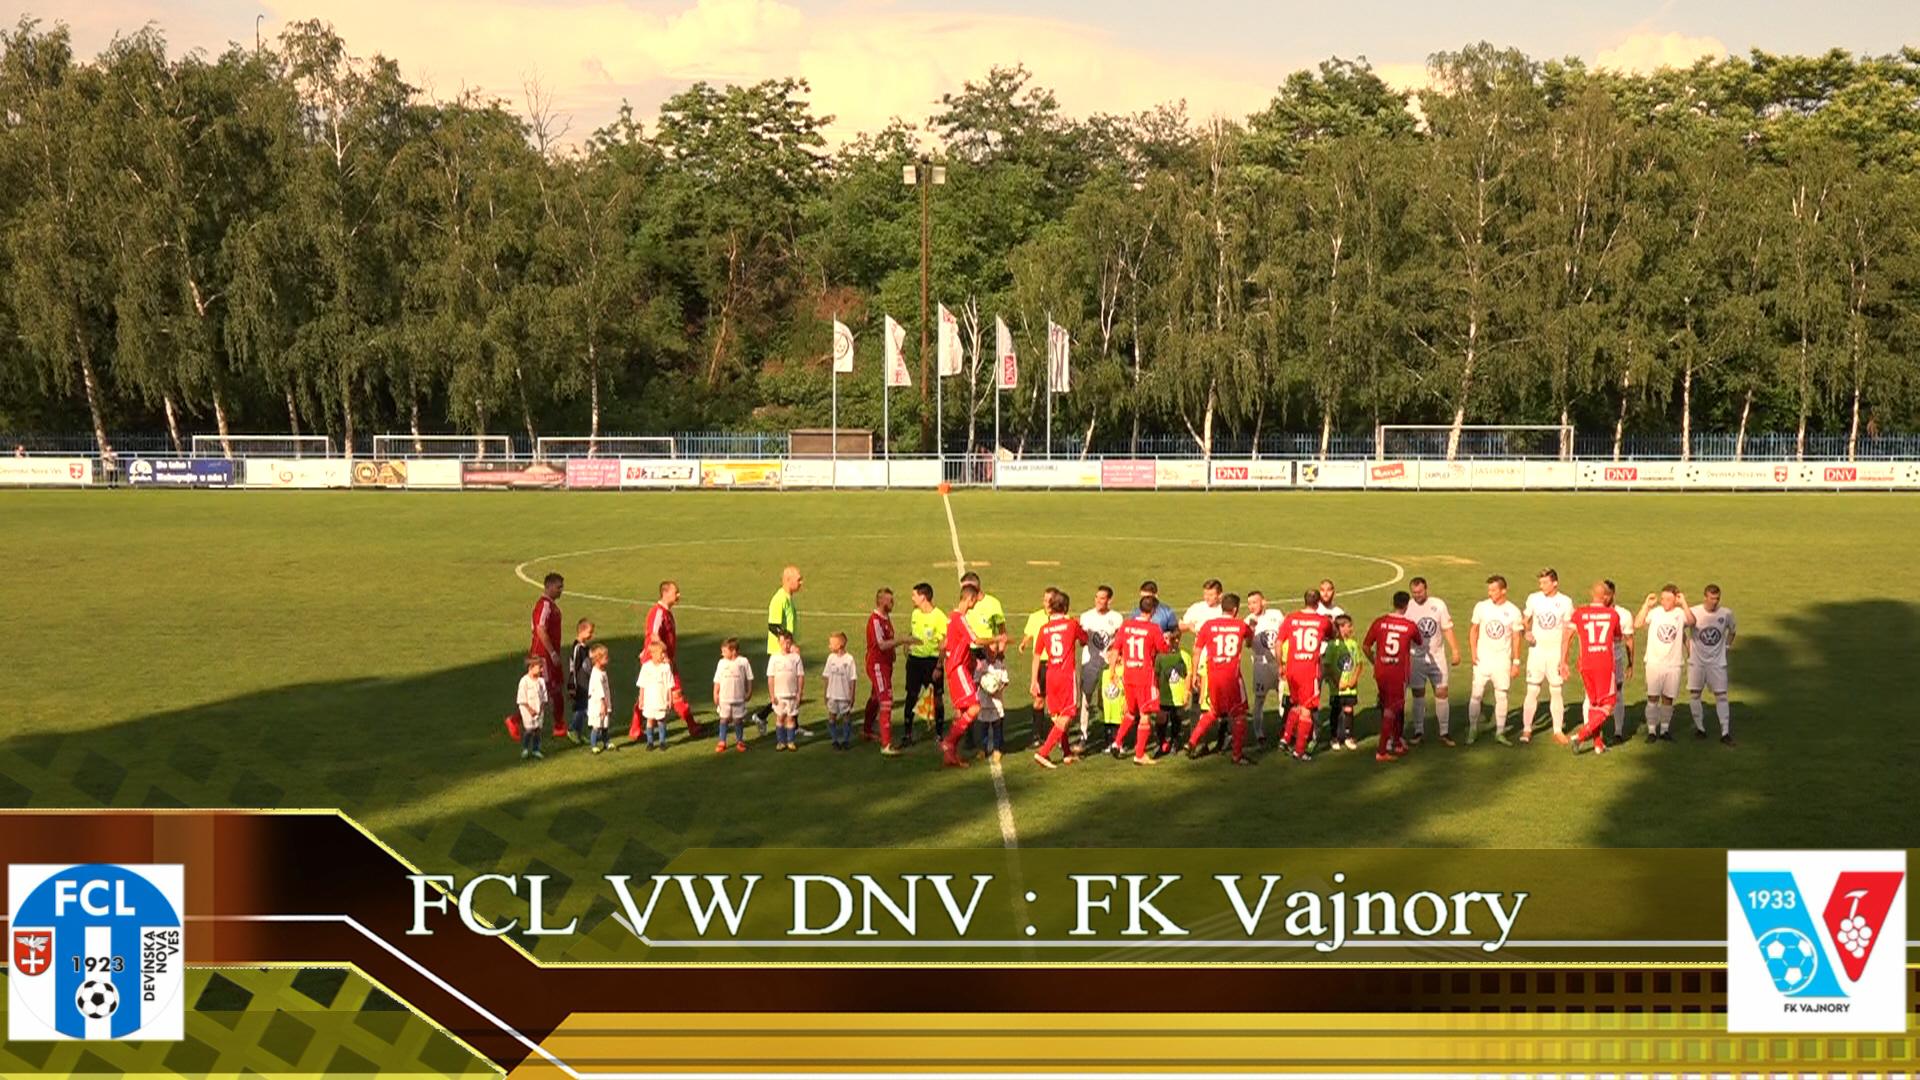 FCL VW DNV : FK Vajnory